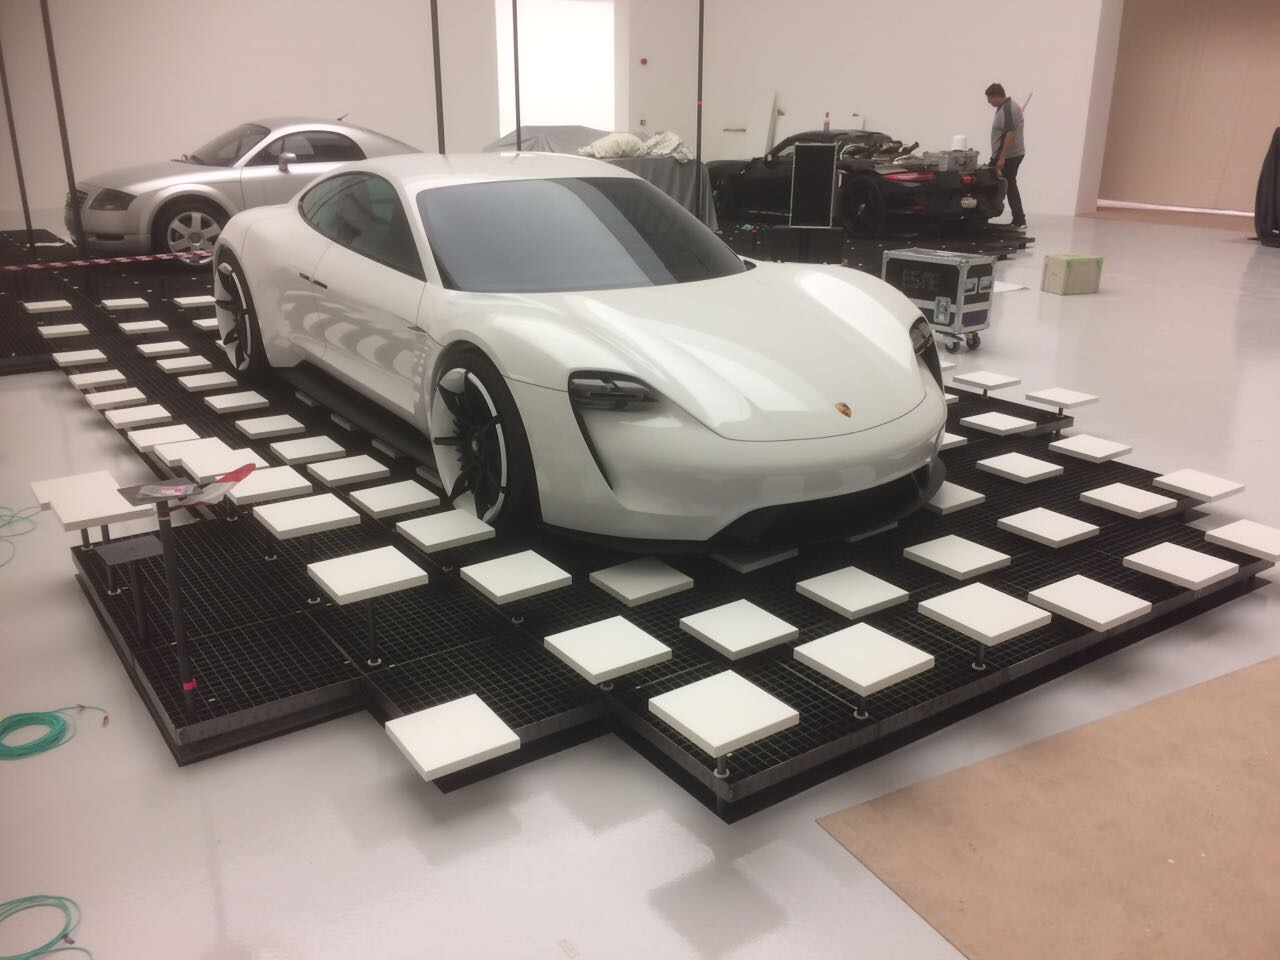 referenz Ausstellung Porsche 2017